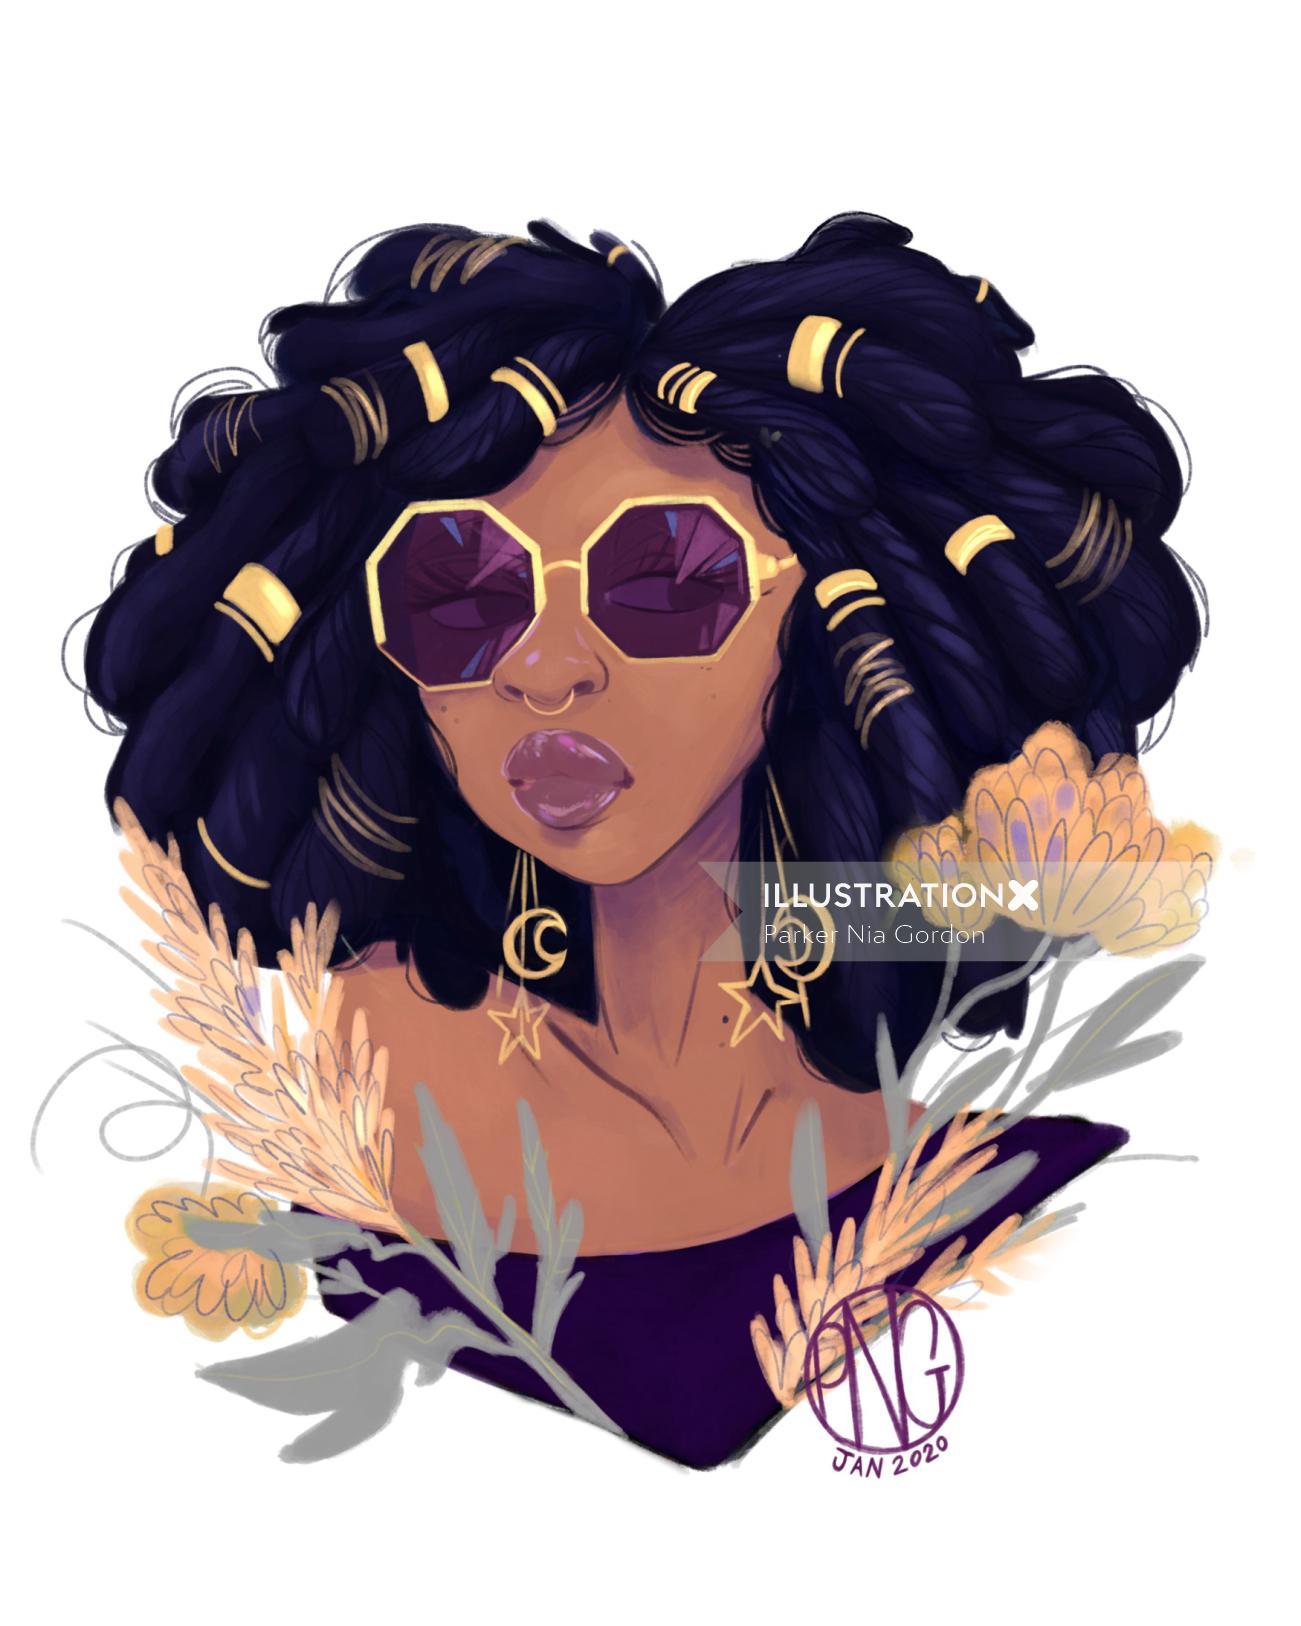 Black beauty portrait illustration